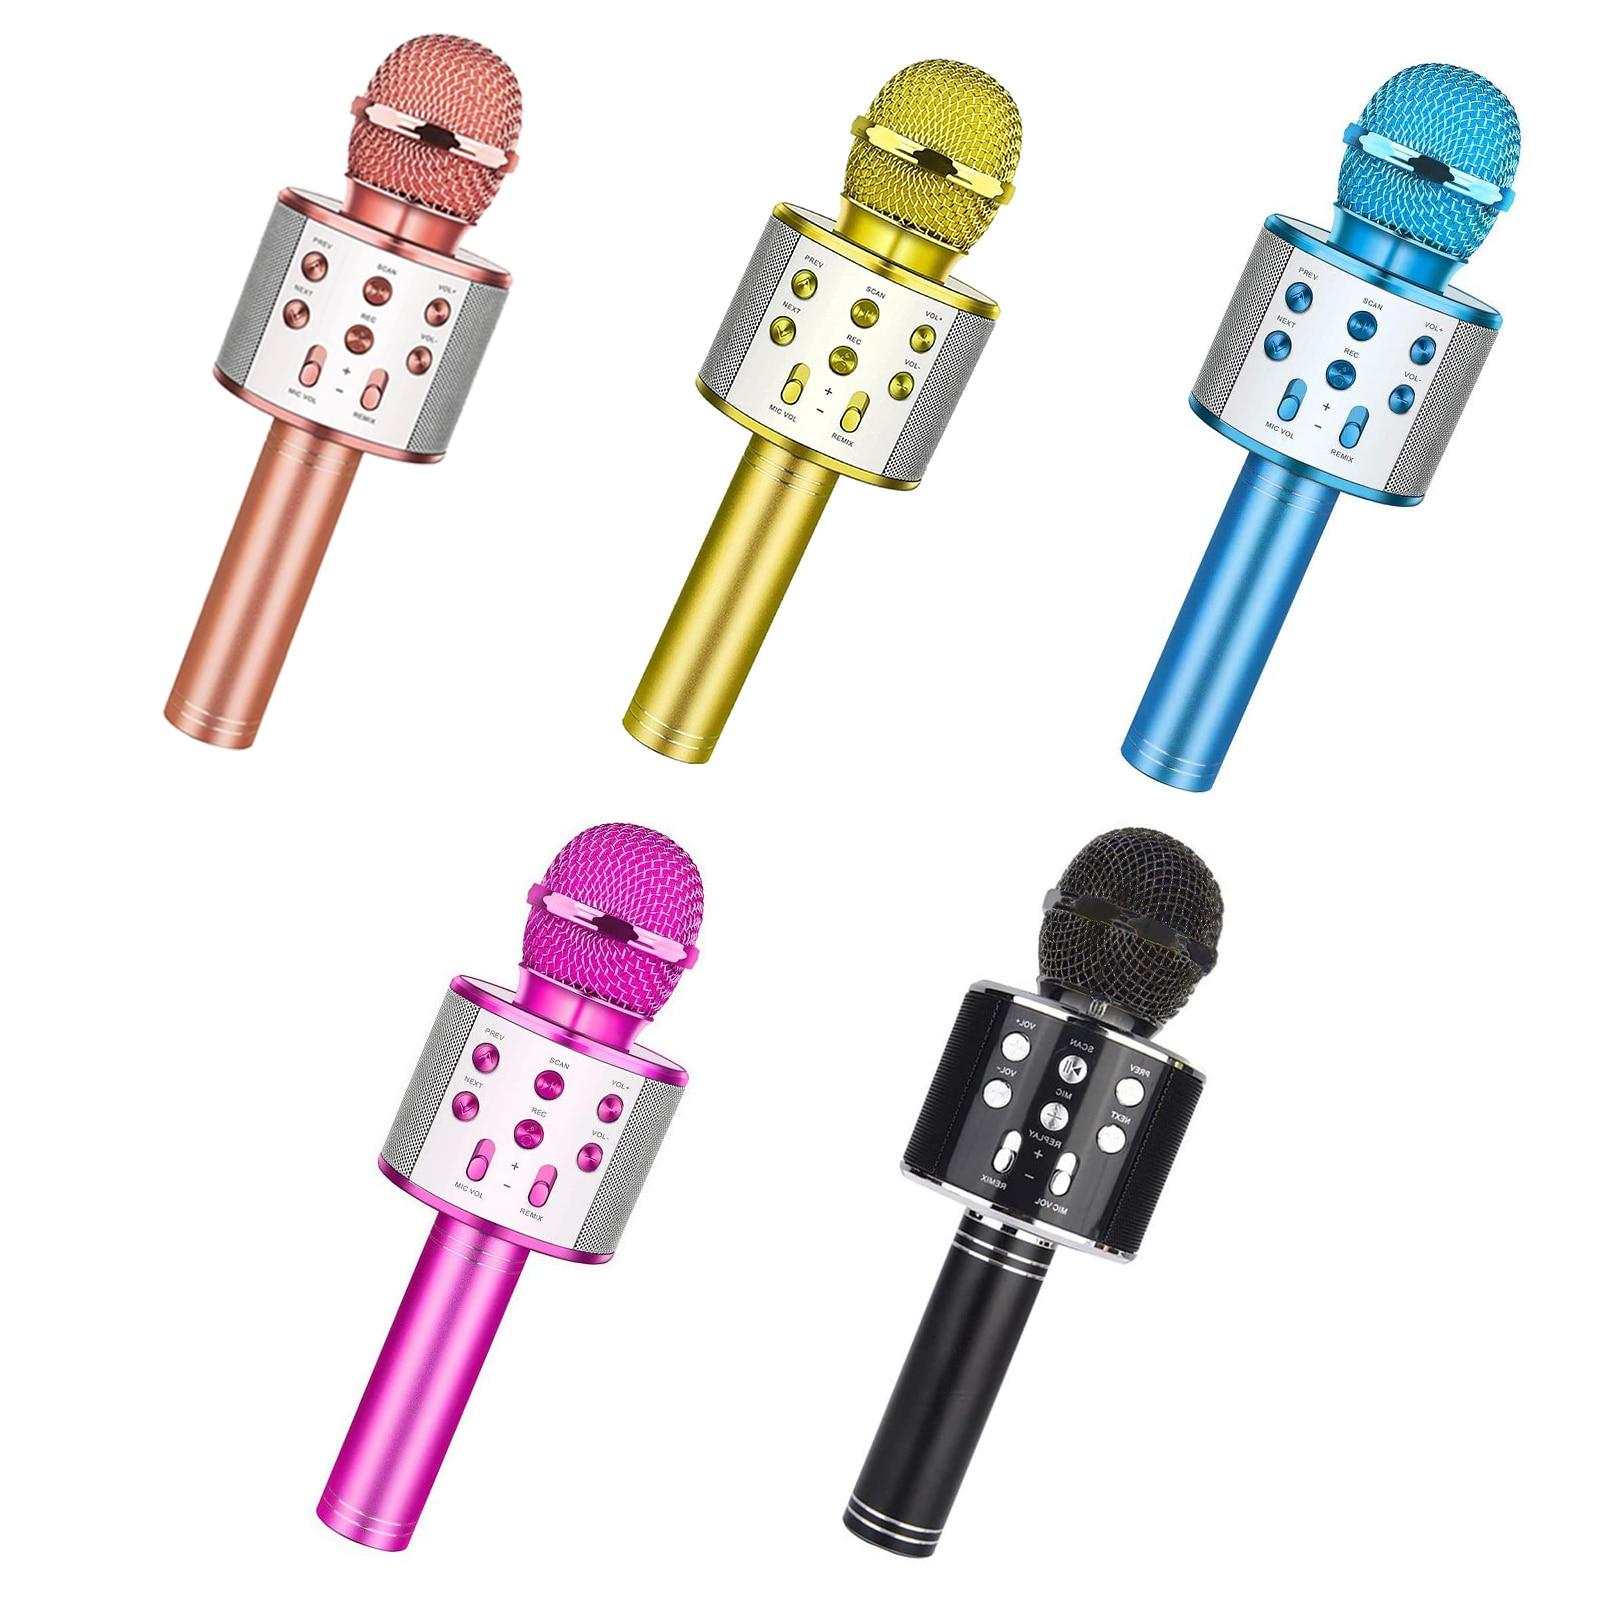 Ws858 portátil bluetooth karaoke microfone sem fio profissional alto falante casa ktv handheld microfone|Microfones|   -